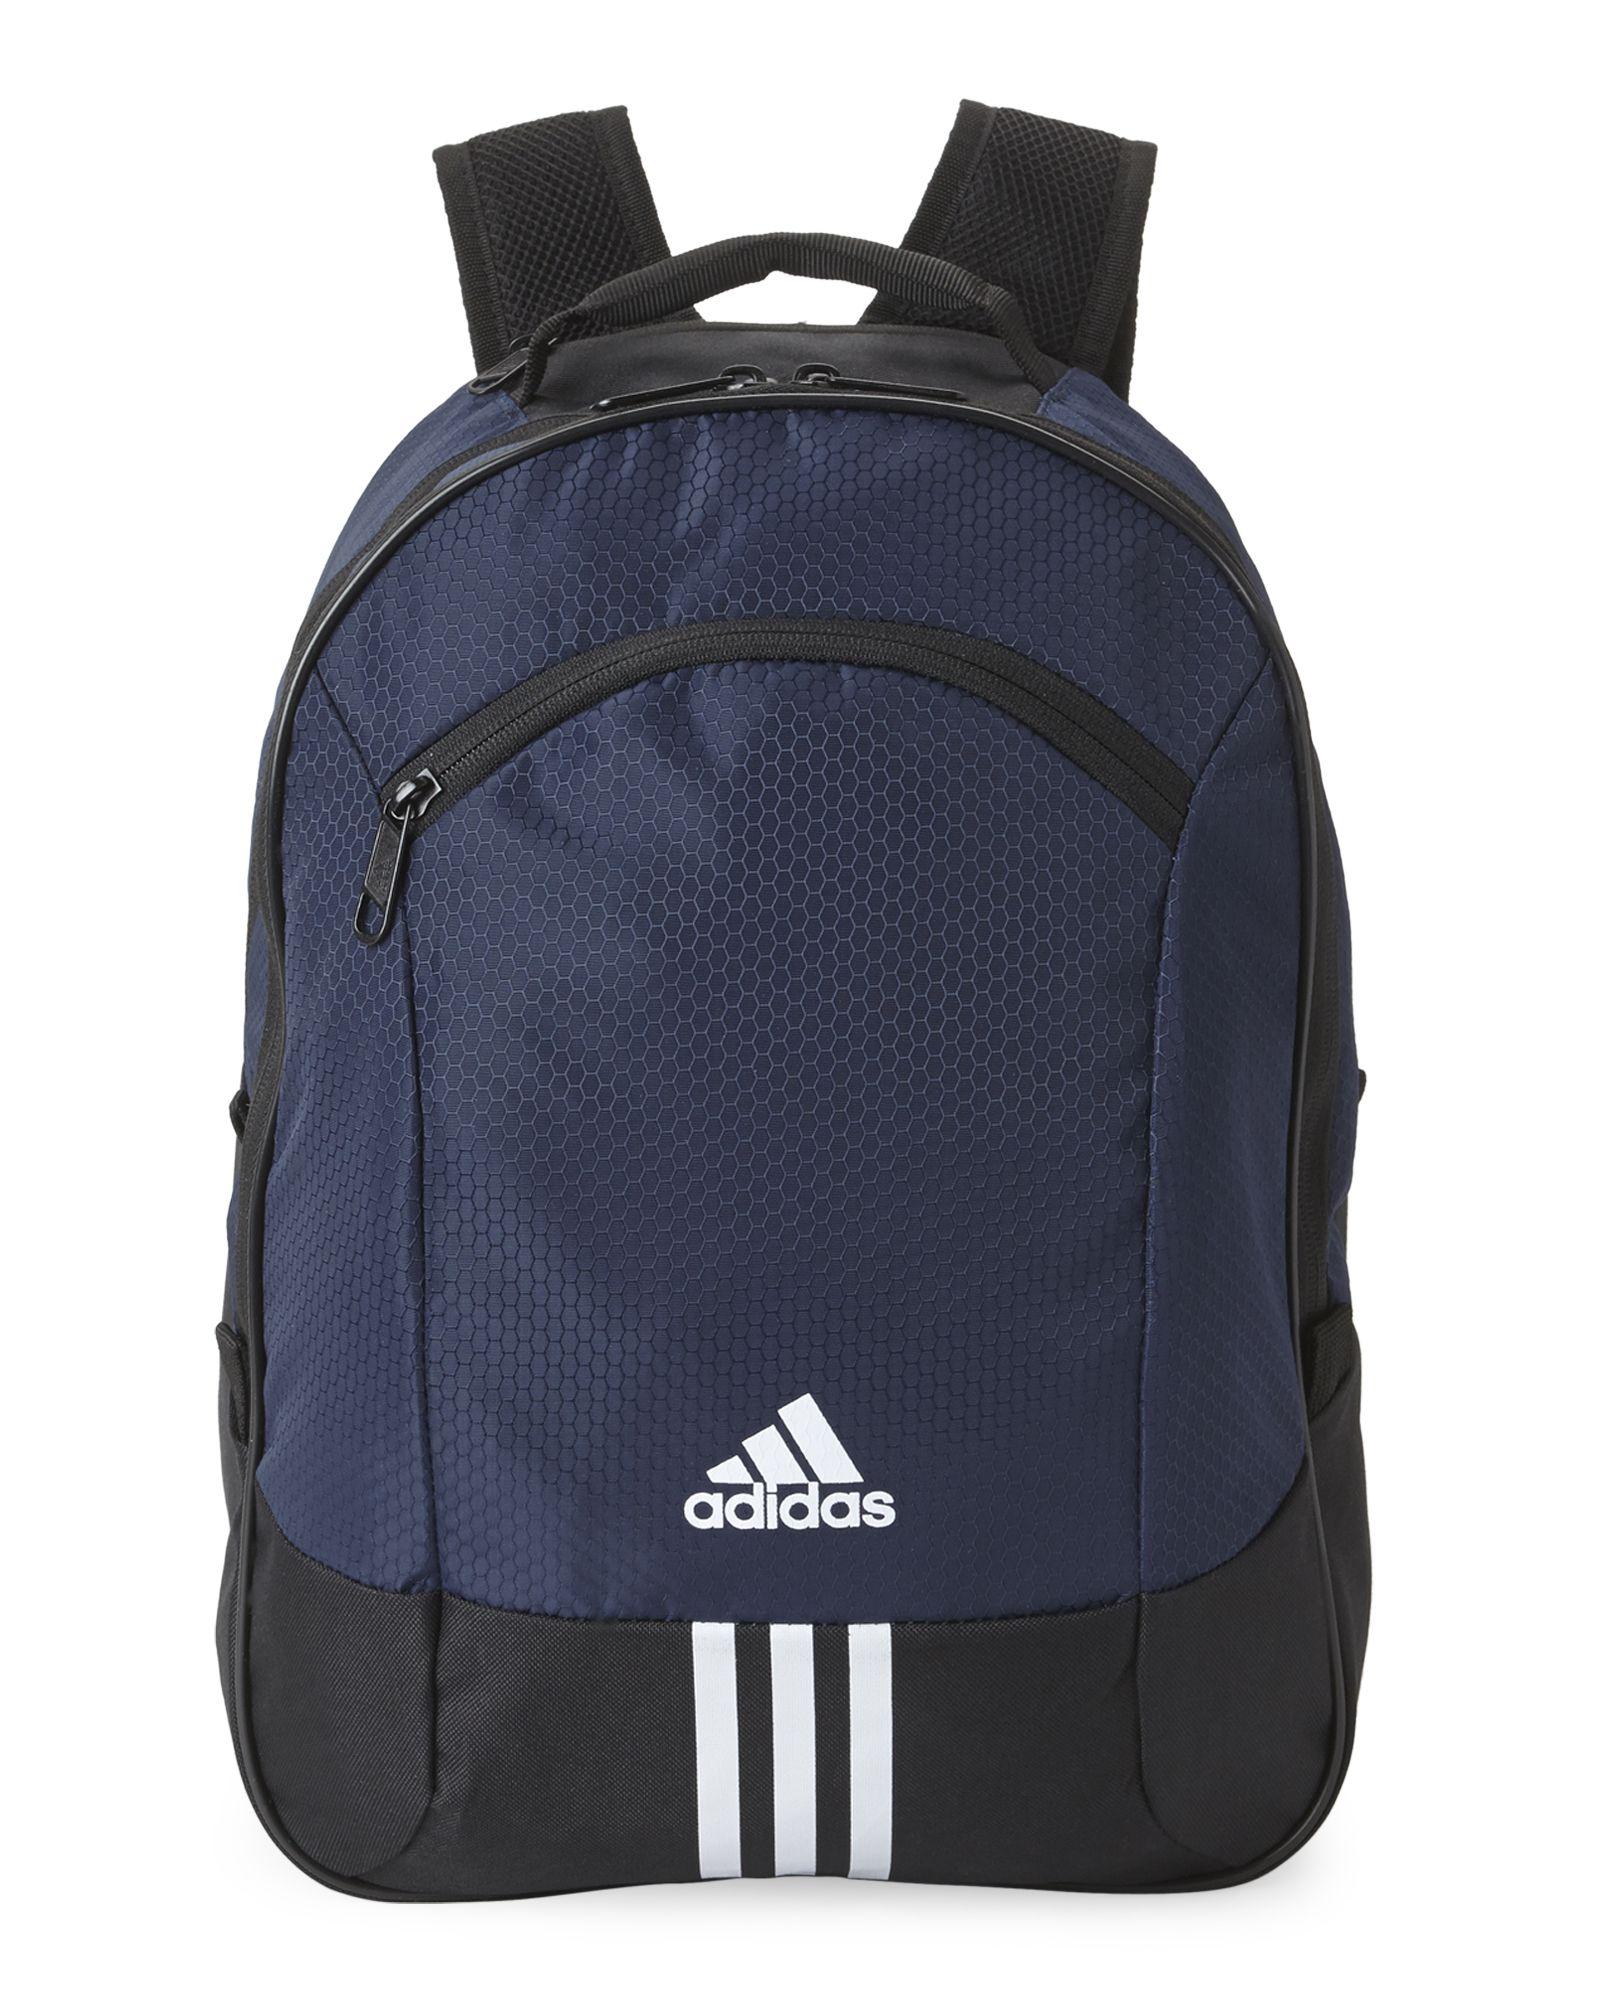 fe34b36418 Adidas Navy Pincer Backpack Mesh Backpack, Buy Backpack, North Face Backpack,  Adidas Bags